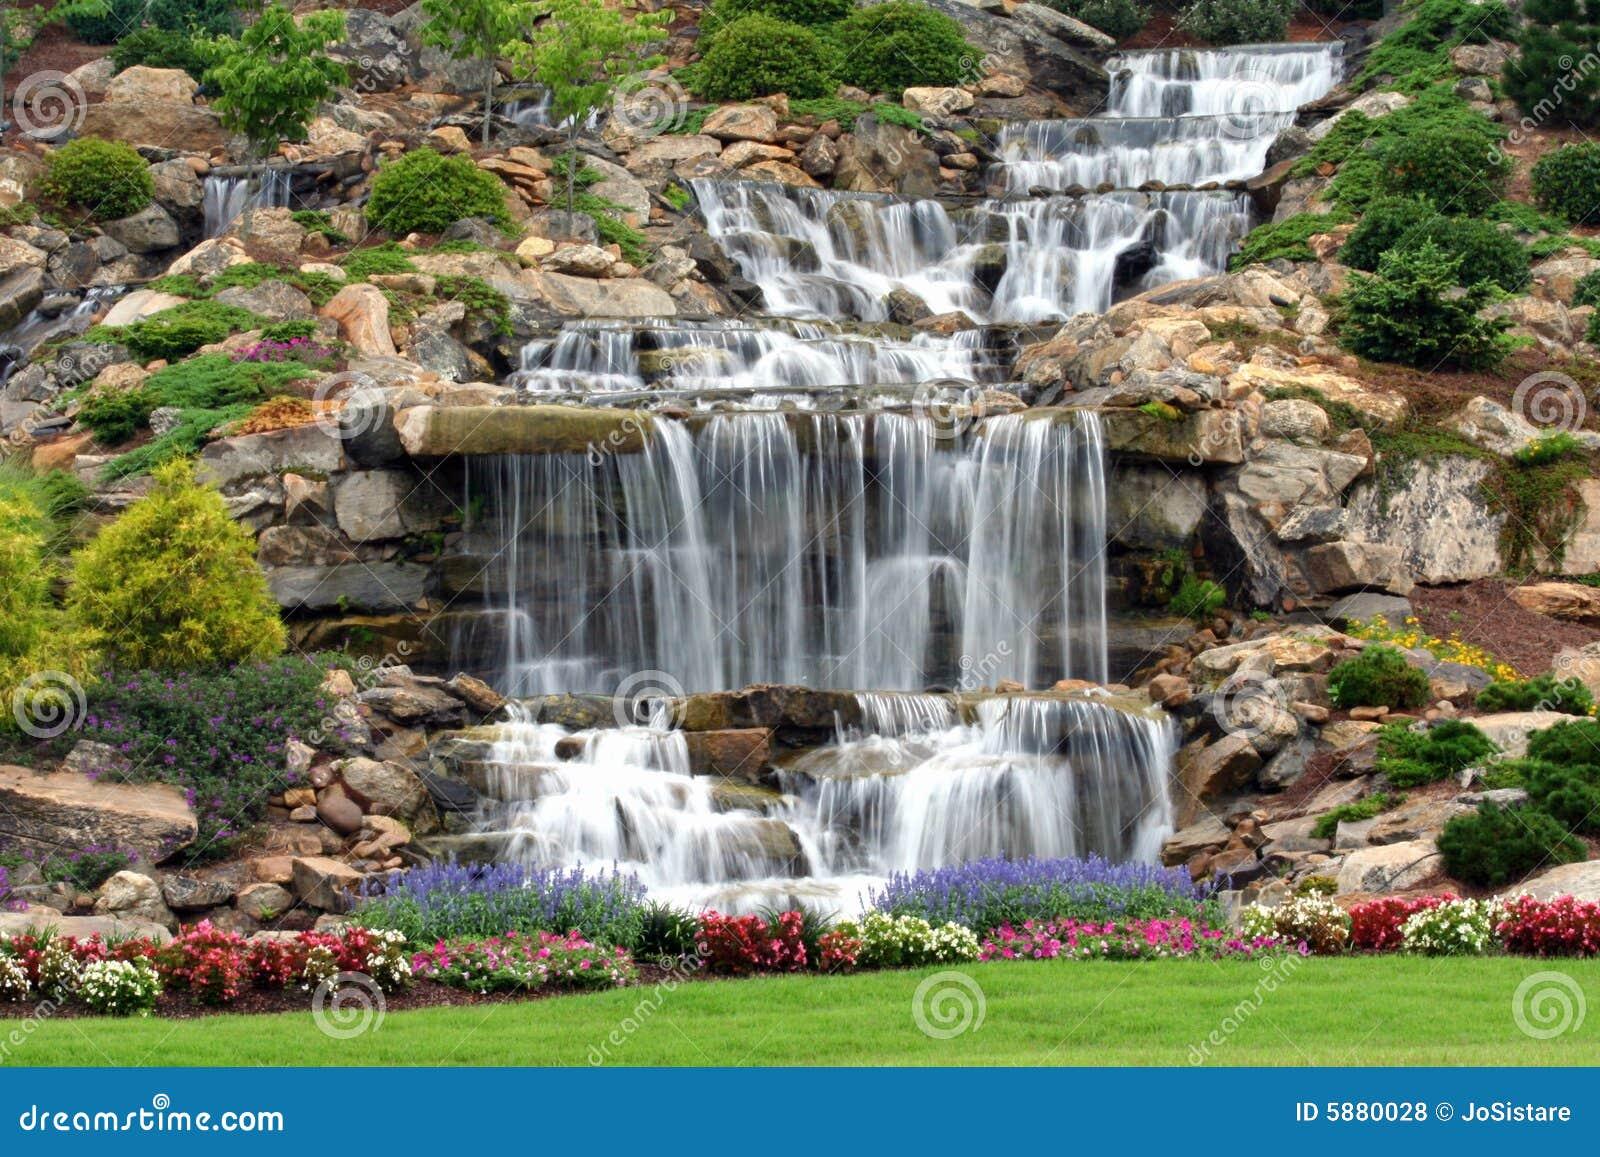 Man Made Waterfall Royalty Free Stock Photos Image 5880028